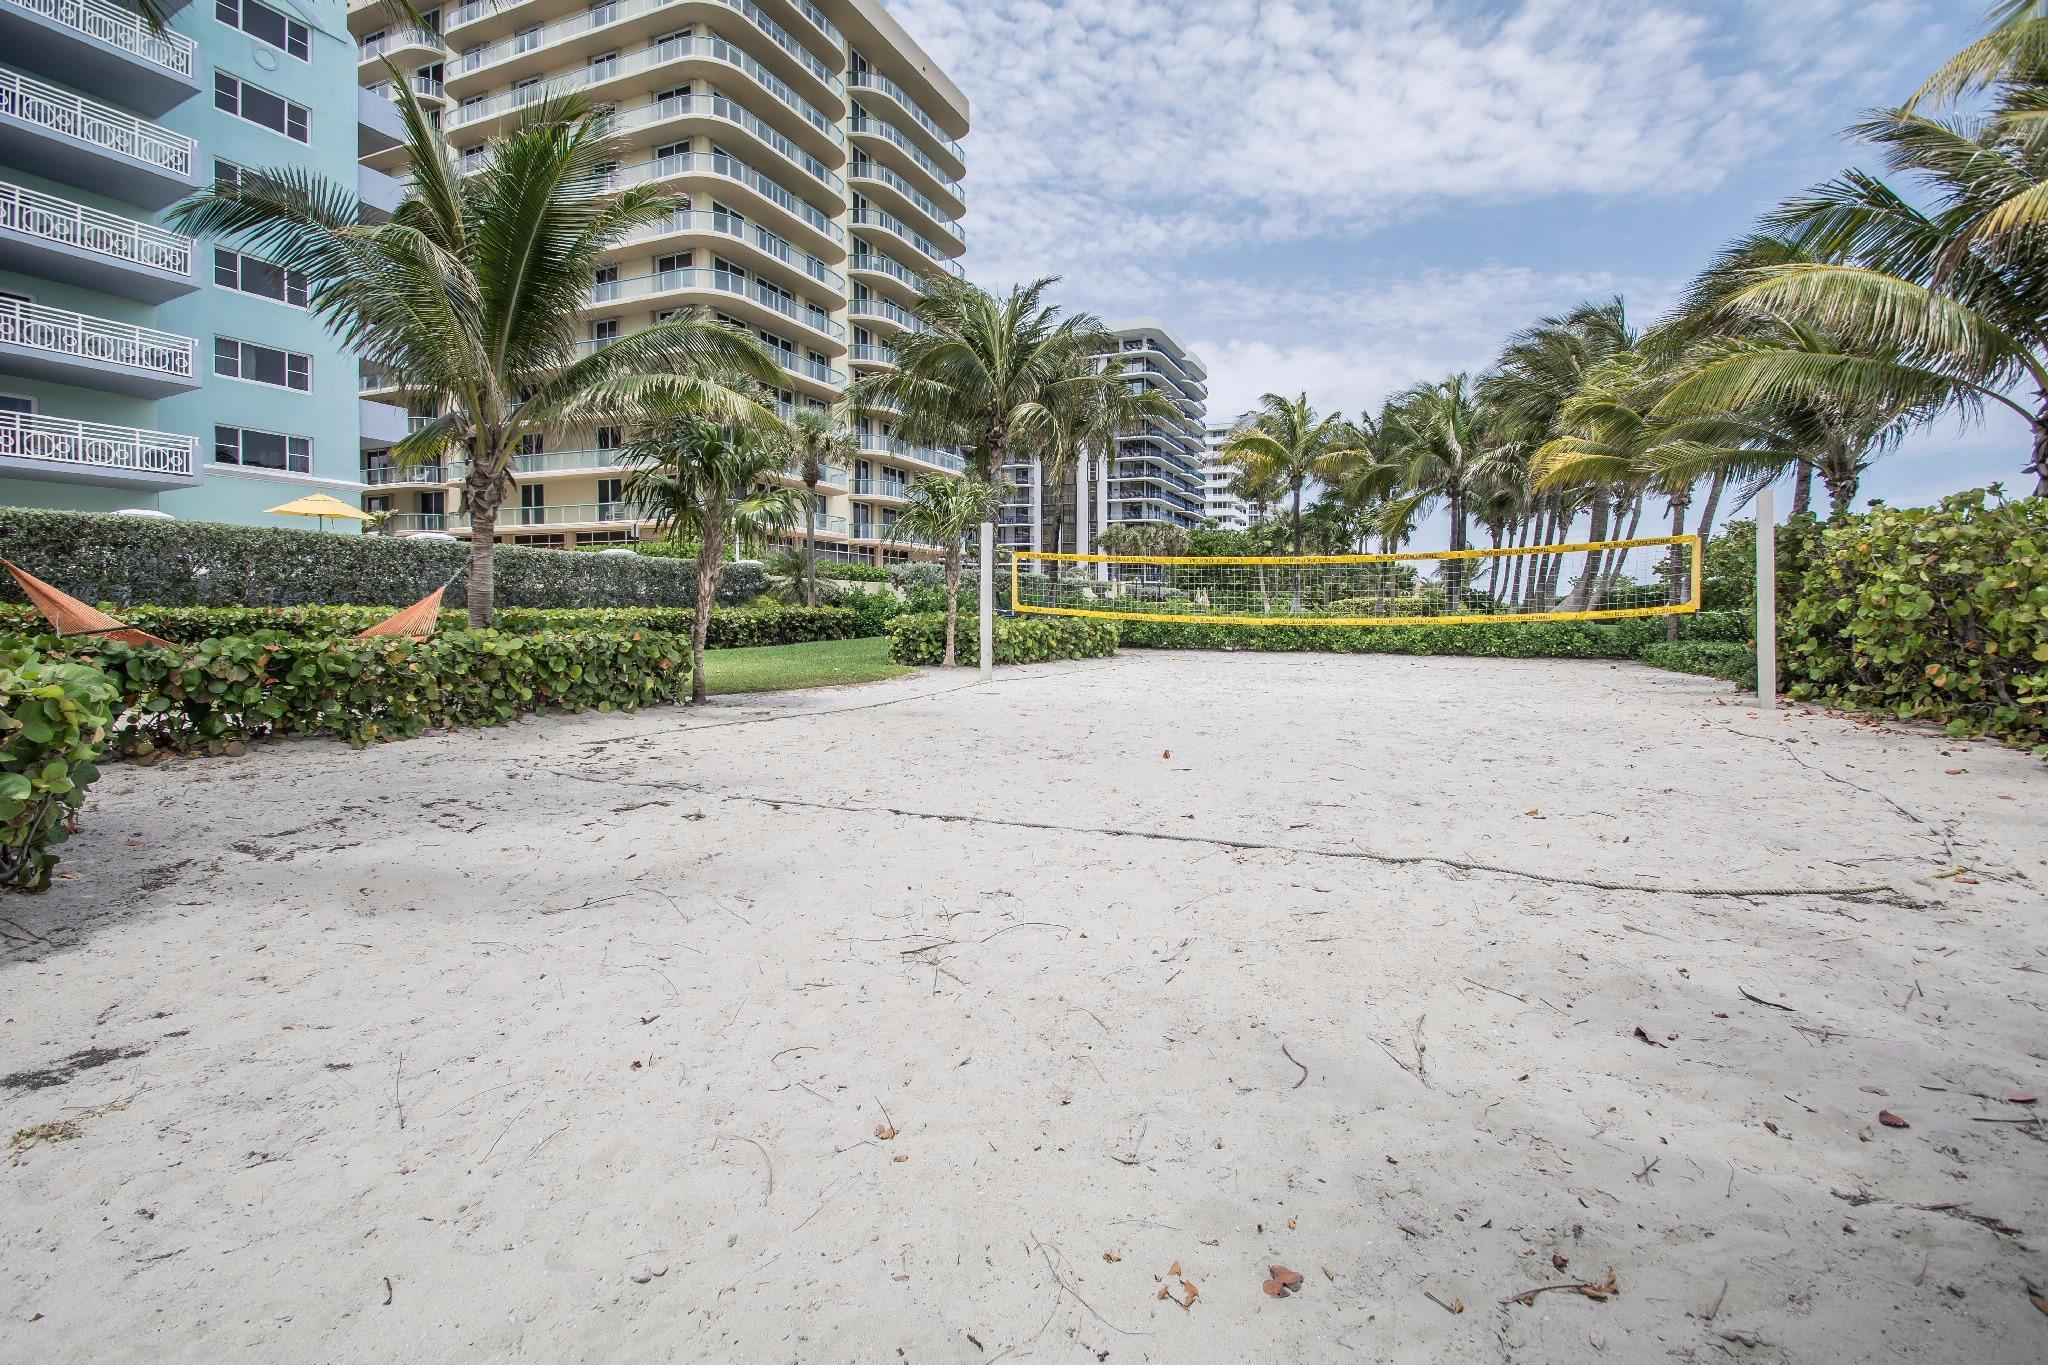 Bluegreen Resort Miami Beach Careers